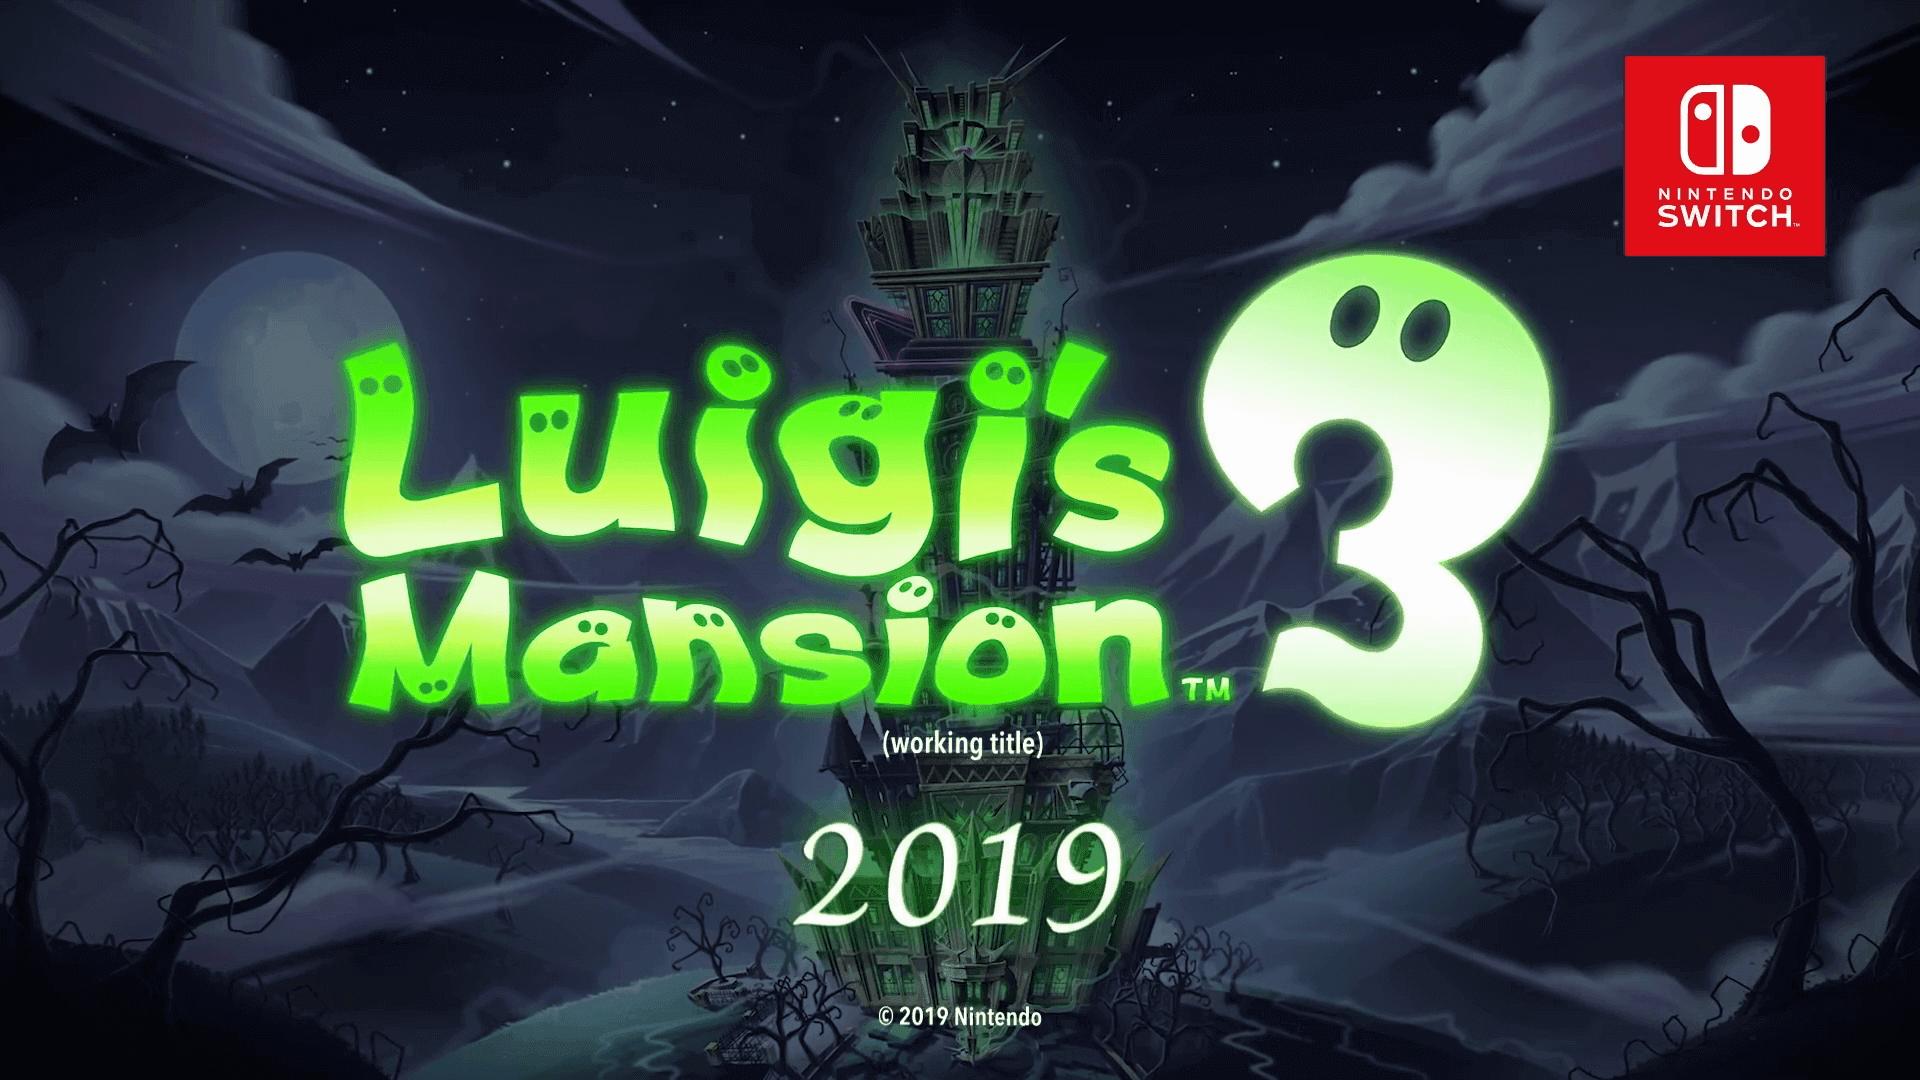 Luigi's Mansion 3 kommt Halloween 2019 17 techboys.de • smarte News, auf den Punkt! Luigi's Mansion 3 kommt Halloween 2019